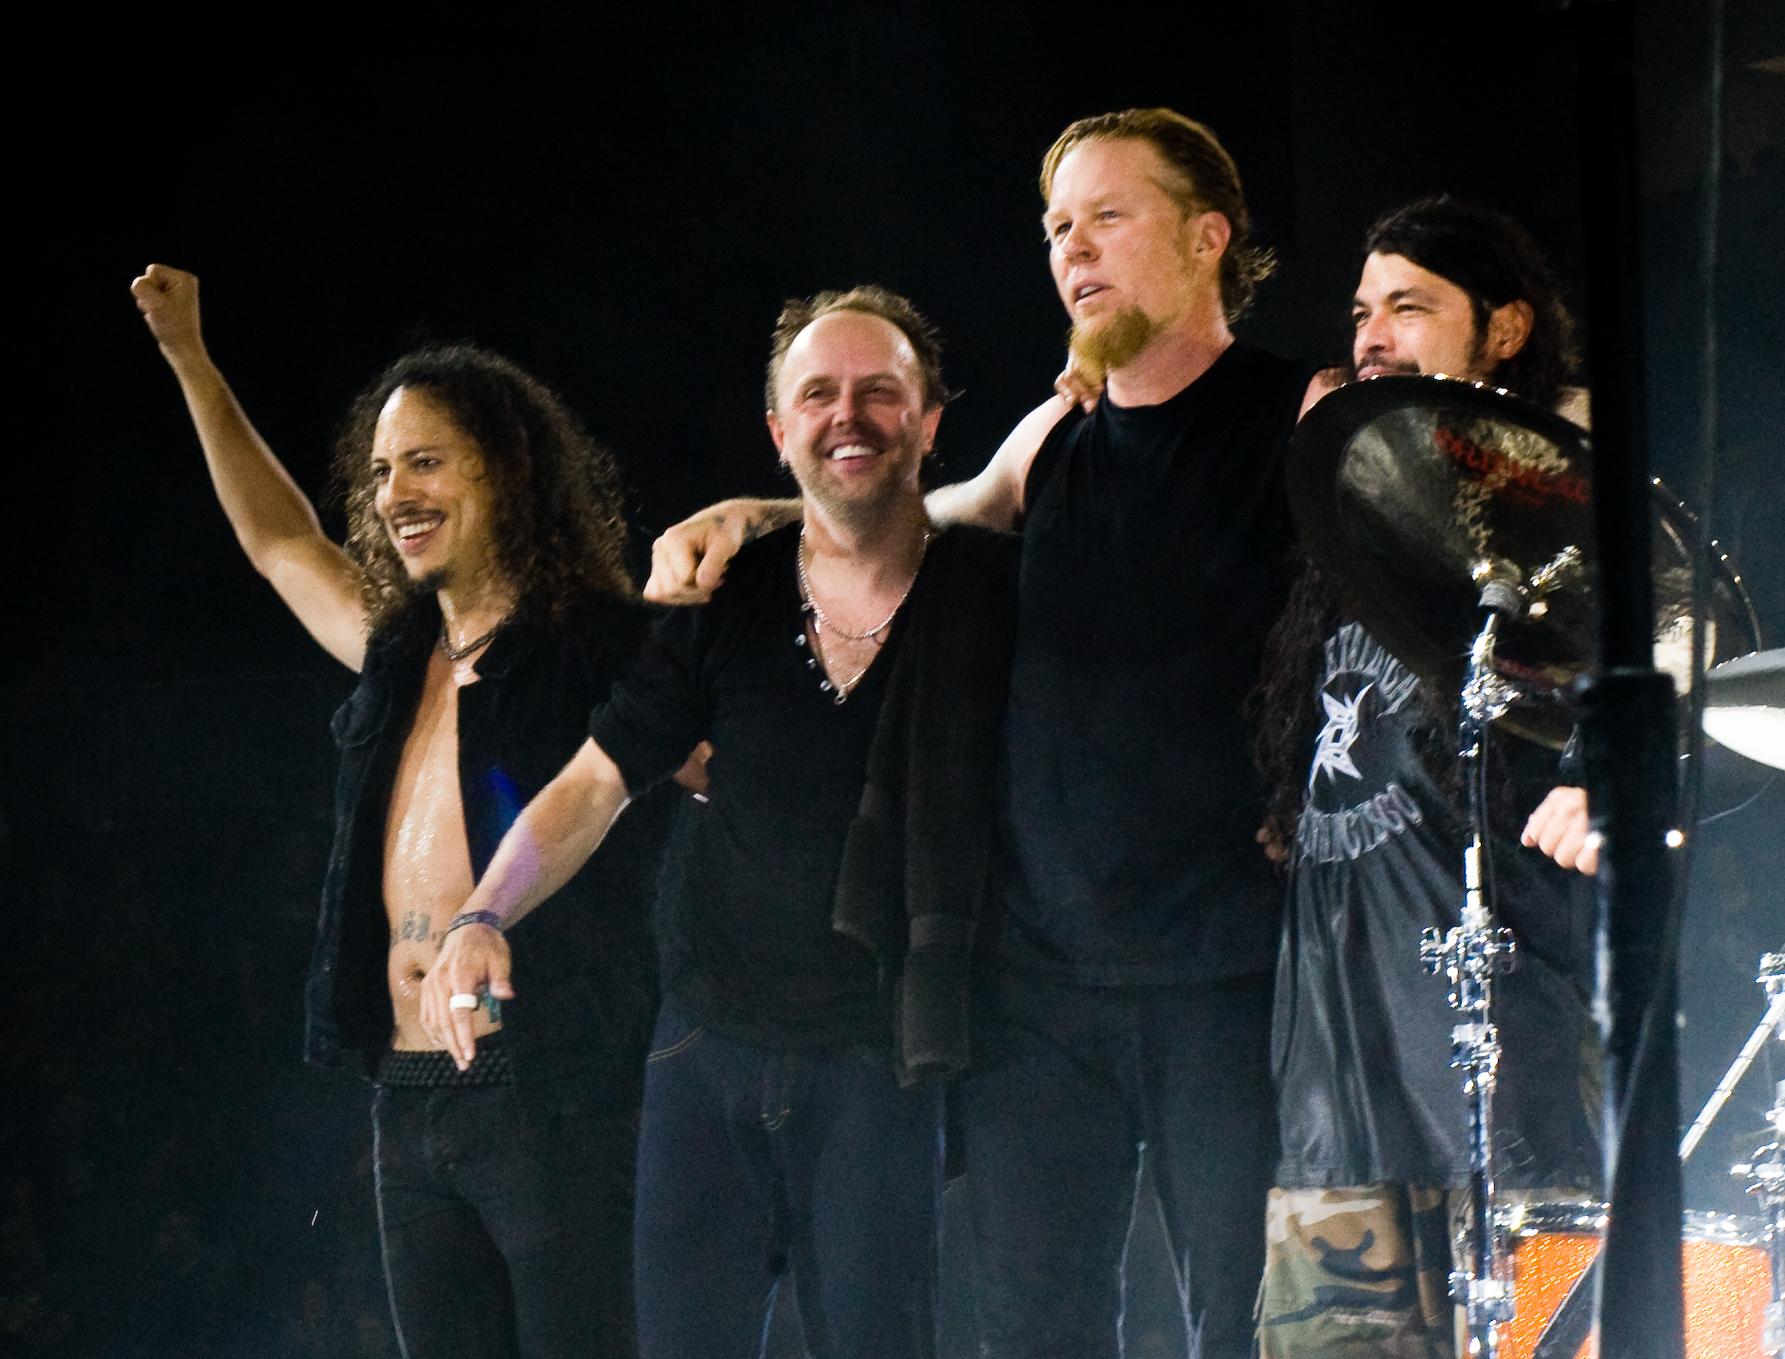 Metallica dona 250.000 euros para la construcción de un hospital pediátrico oncológico en Rumania